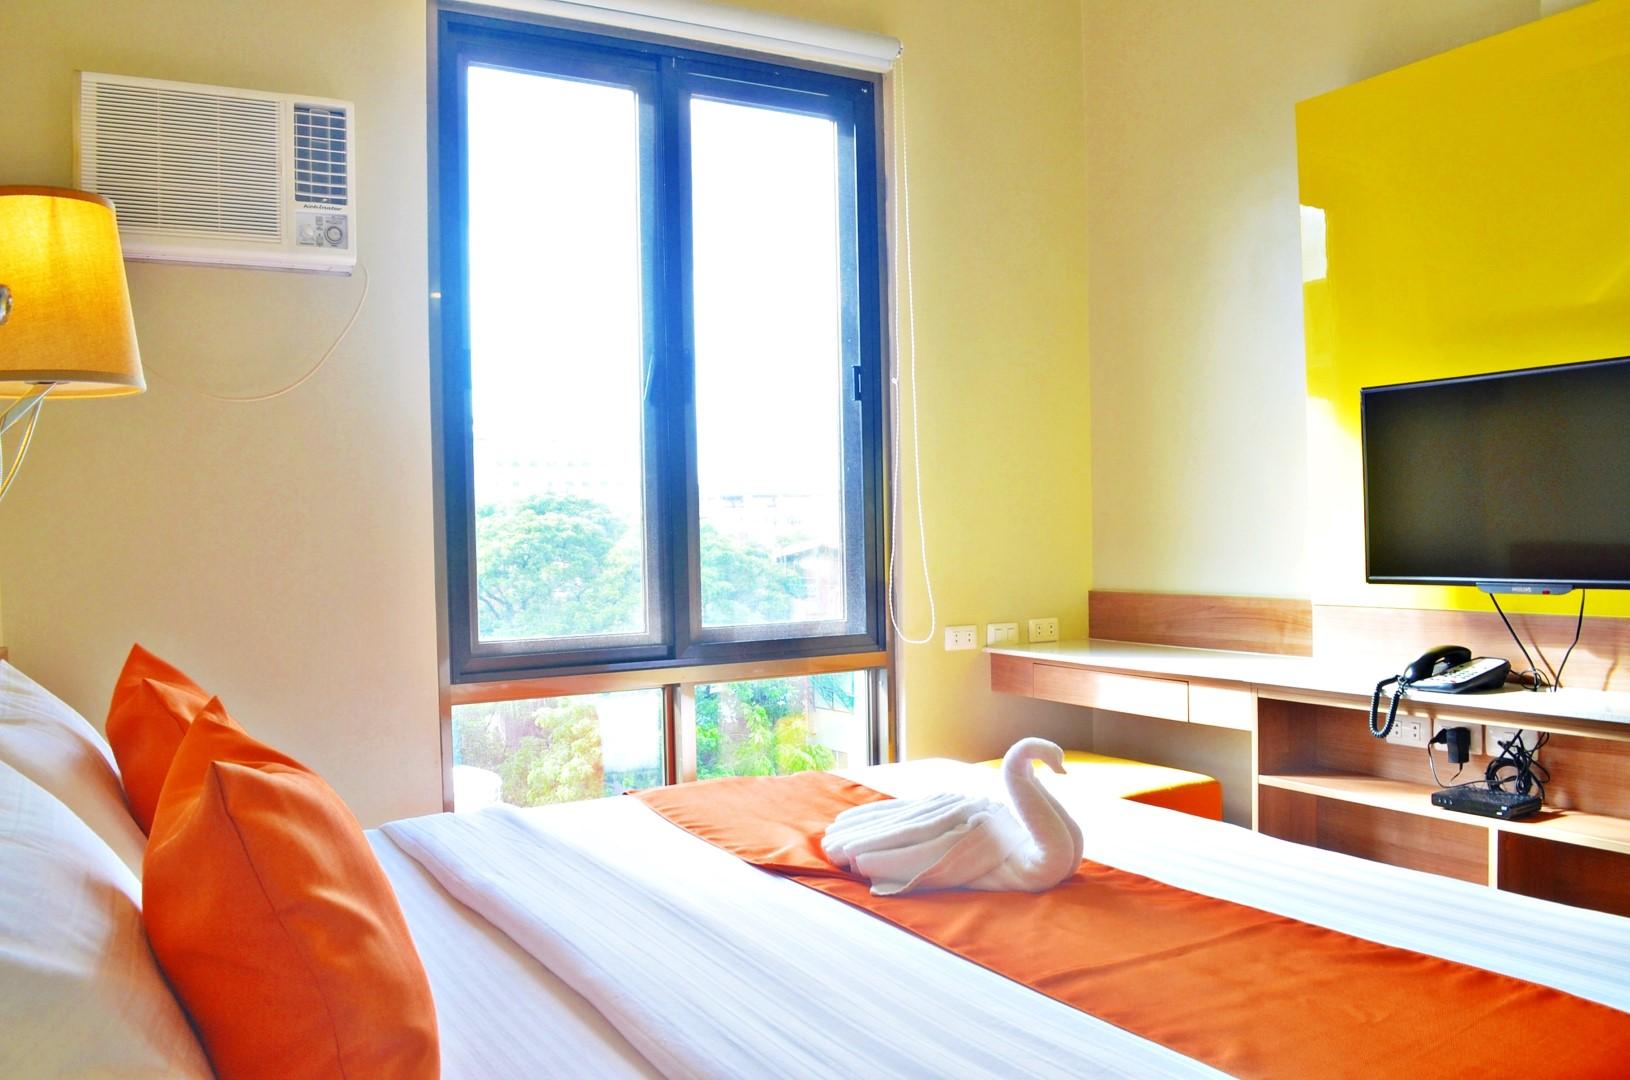 Be Hotel Cebu Room Rates